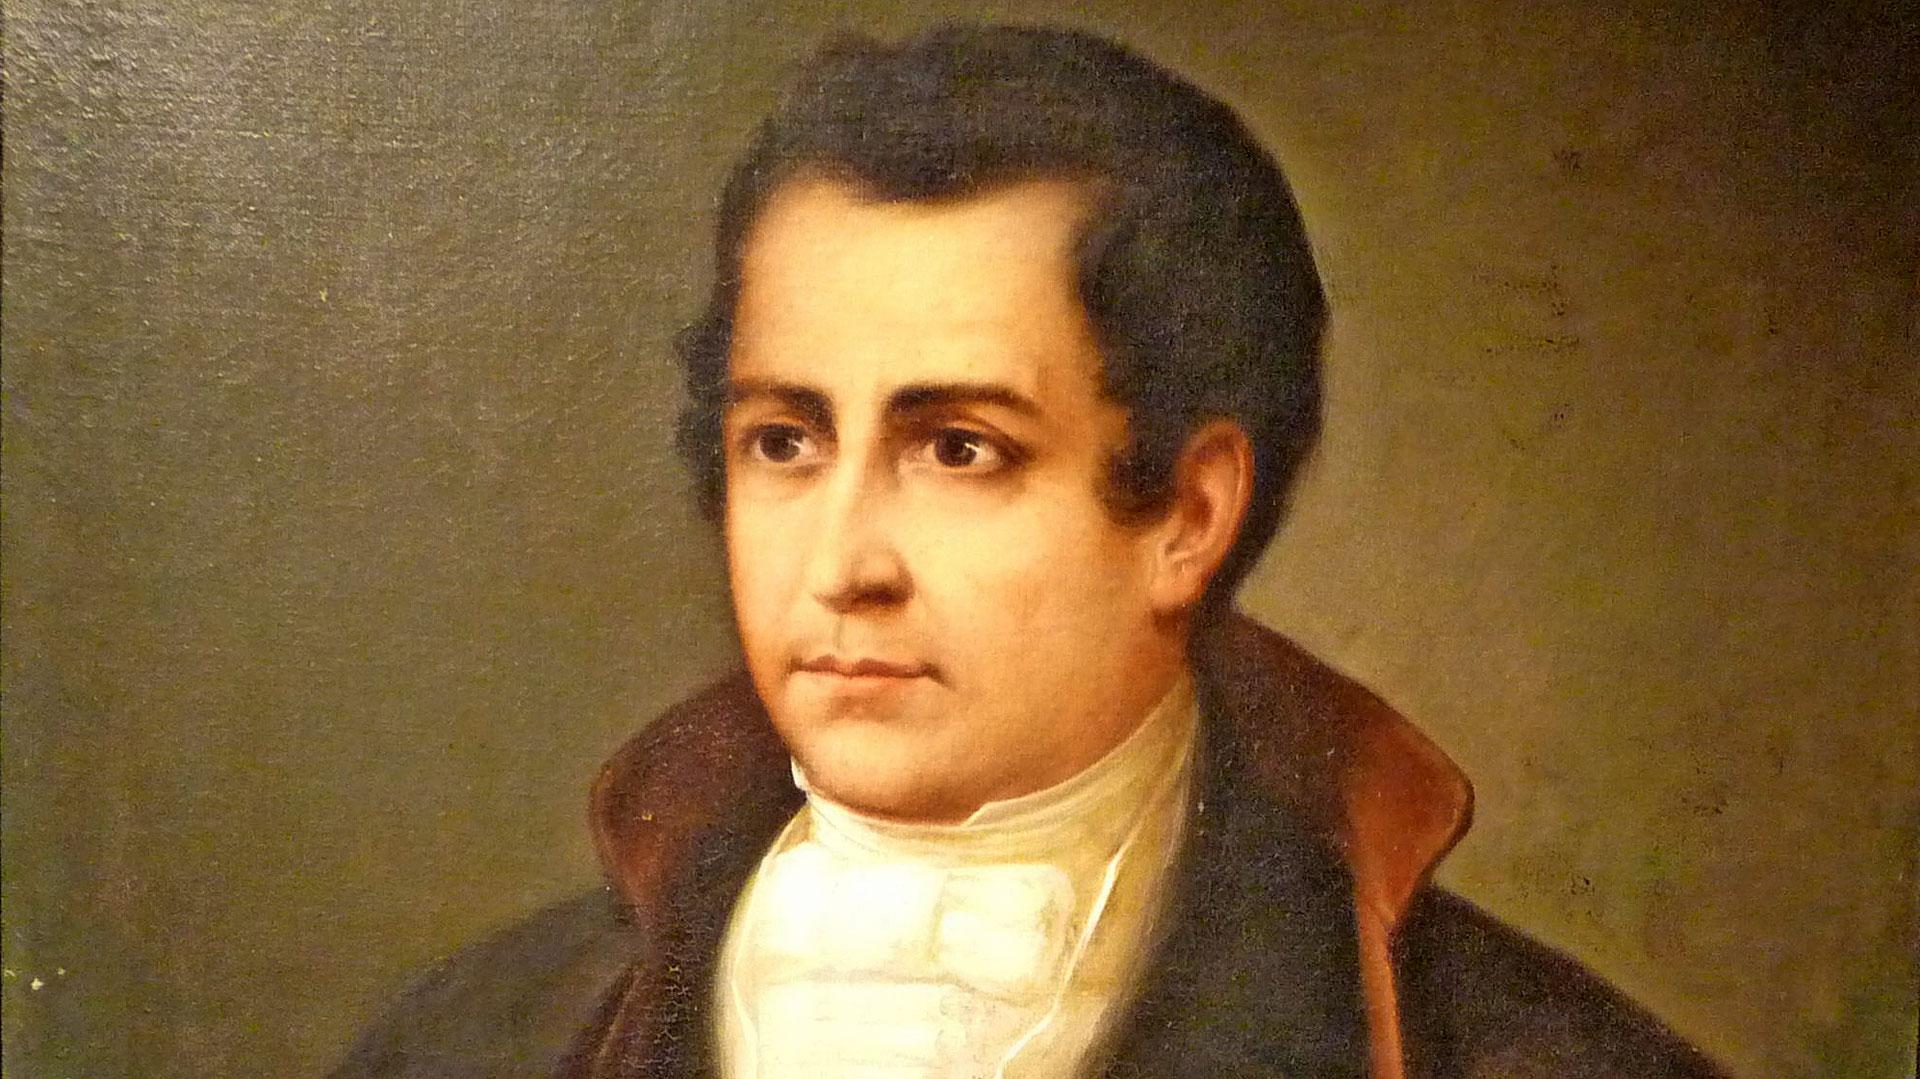 La misteriosa muerte de Mariano Moreno - Infobae